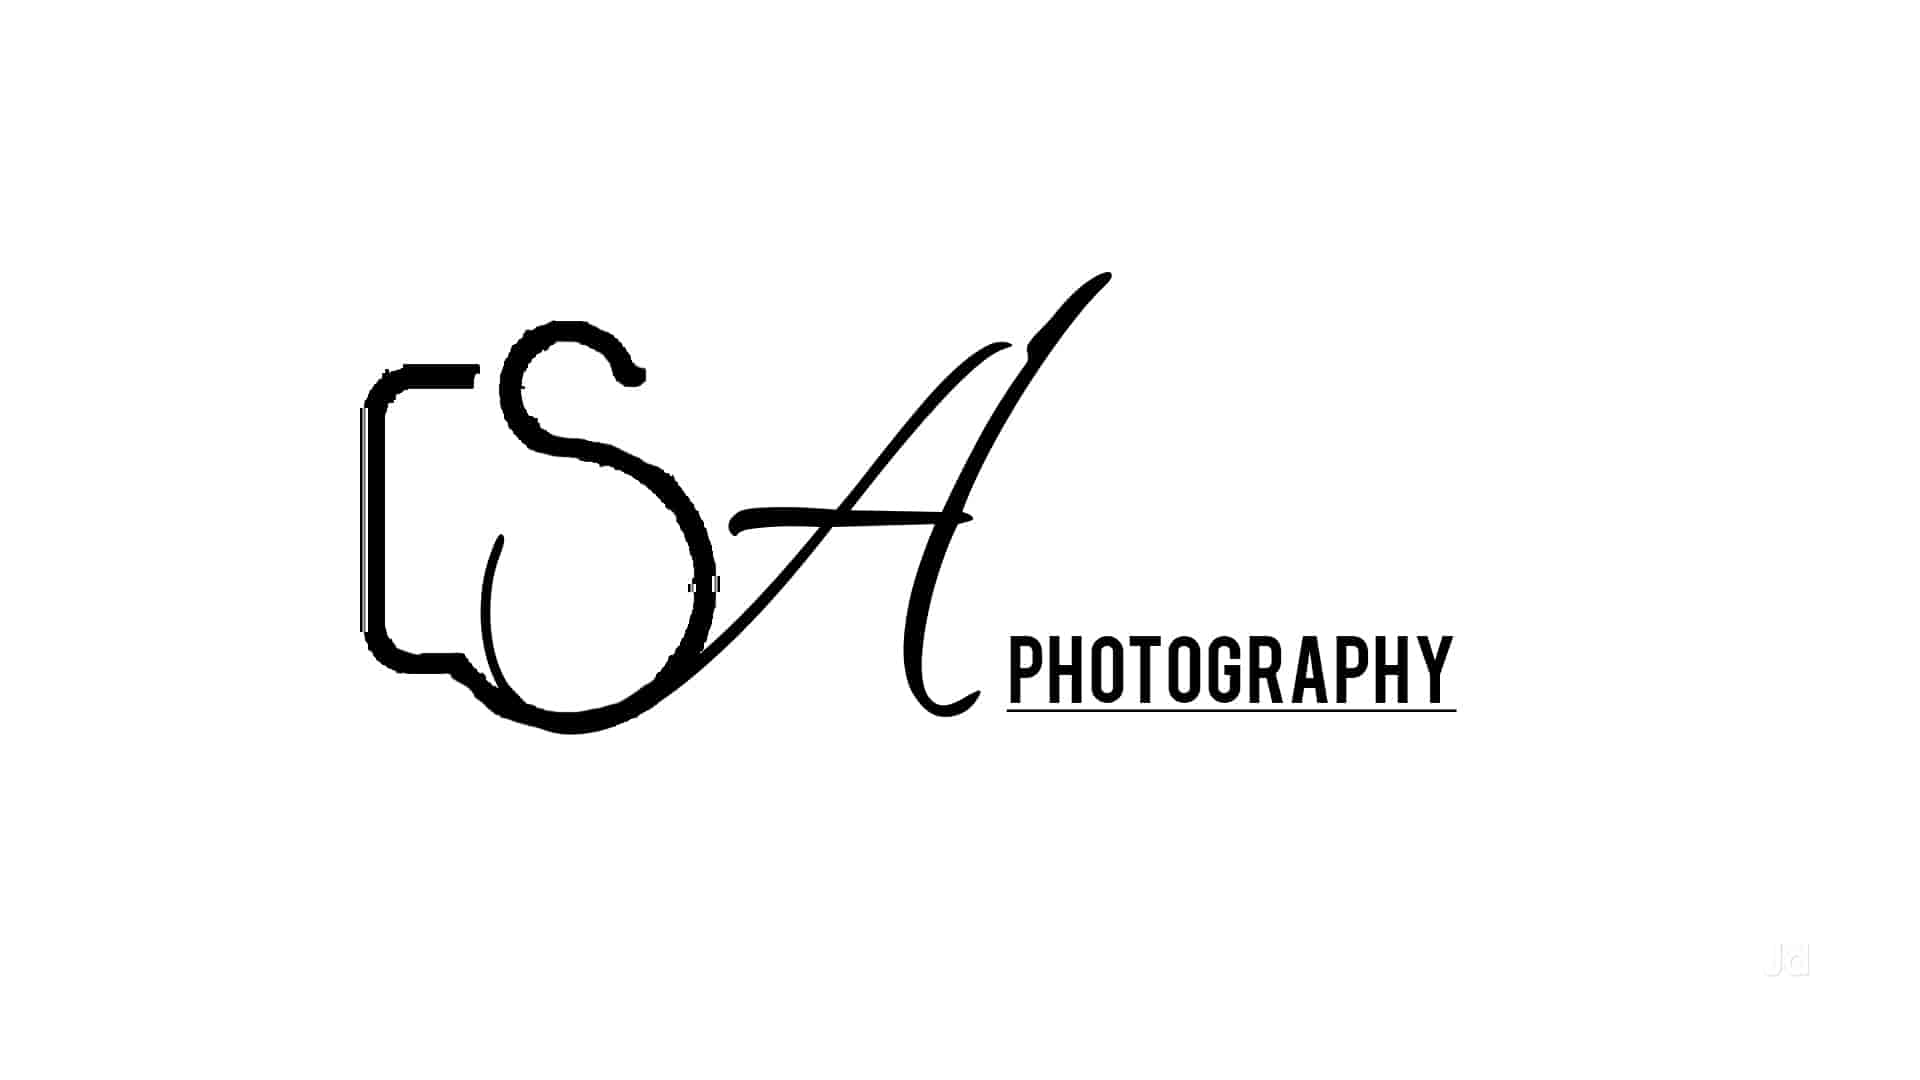 Company logo sa photography photos nanganallur chennai wedding photographers